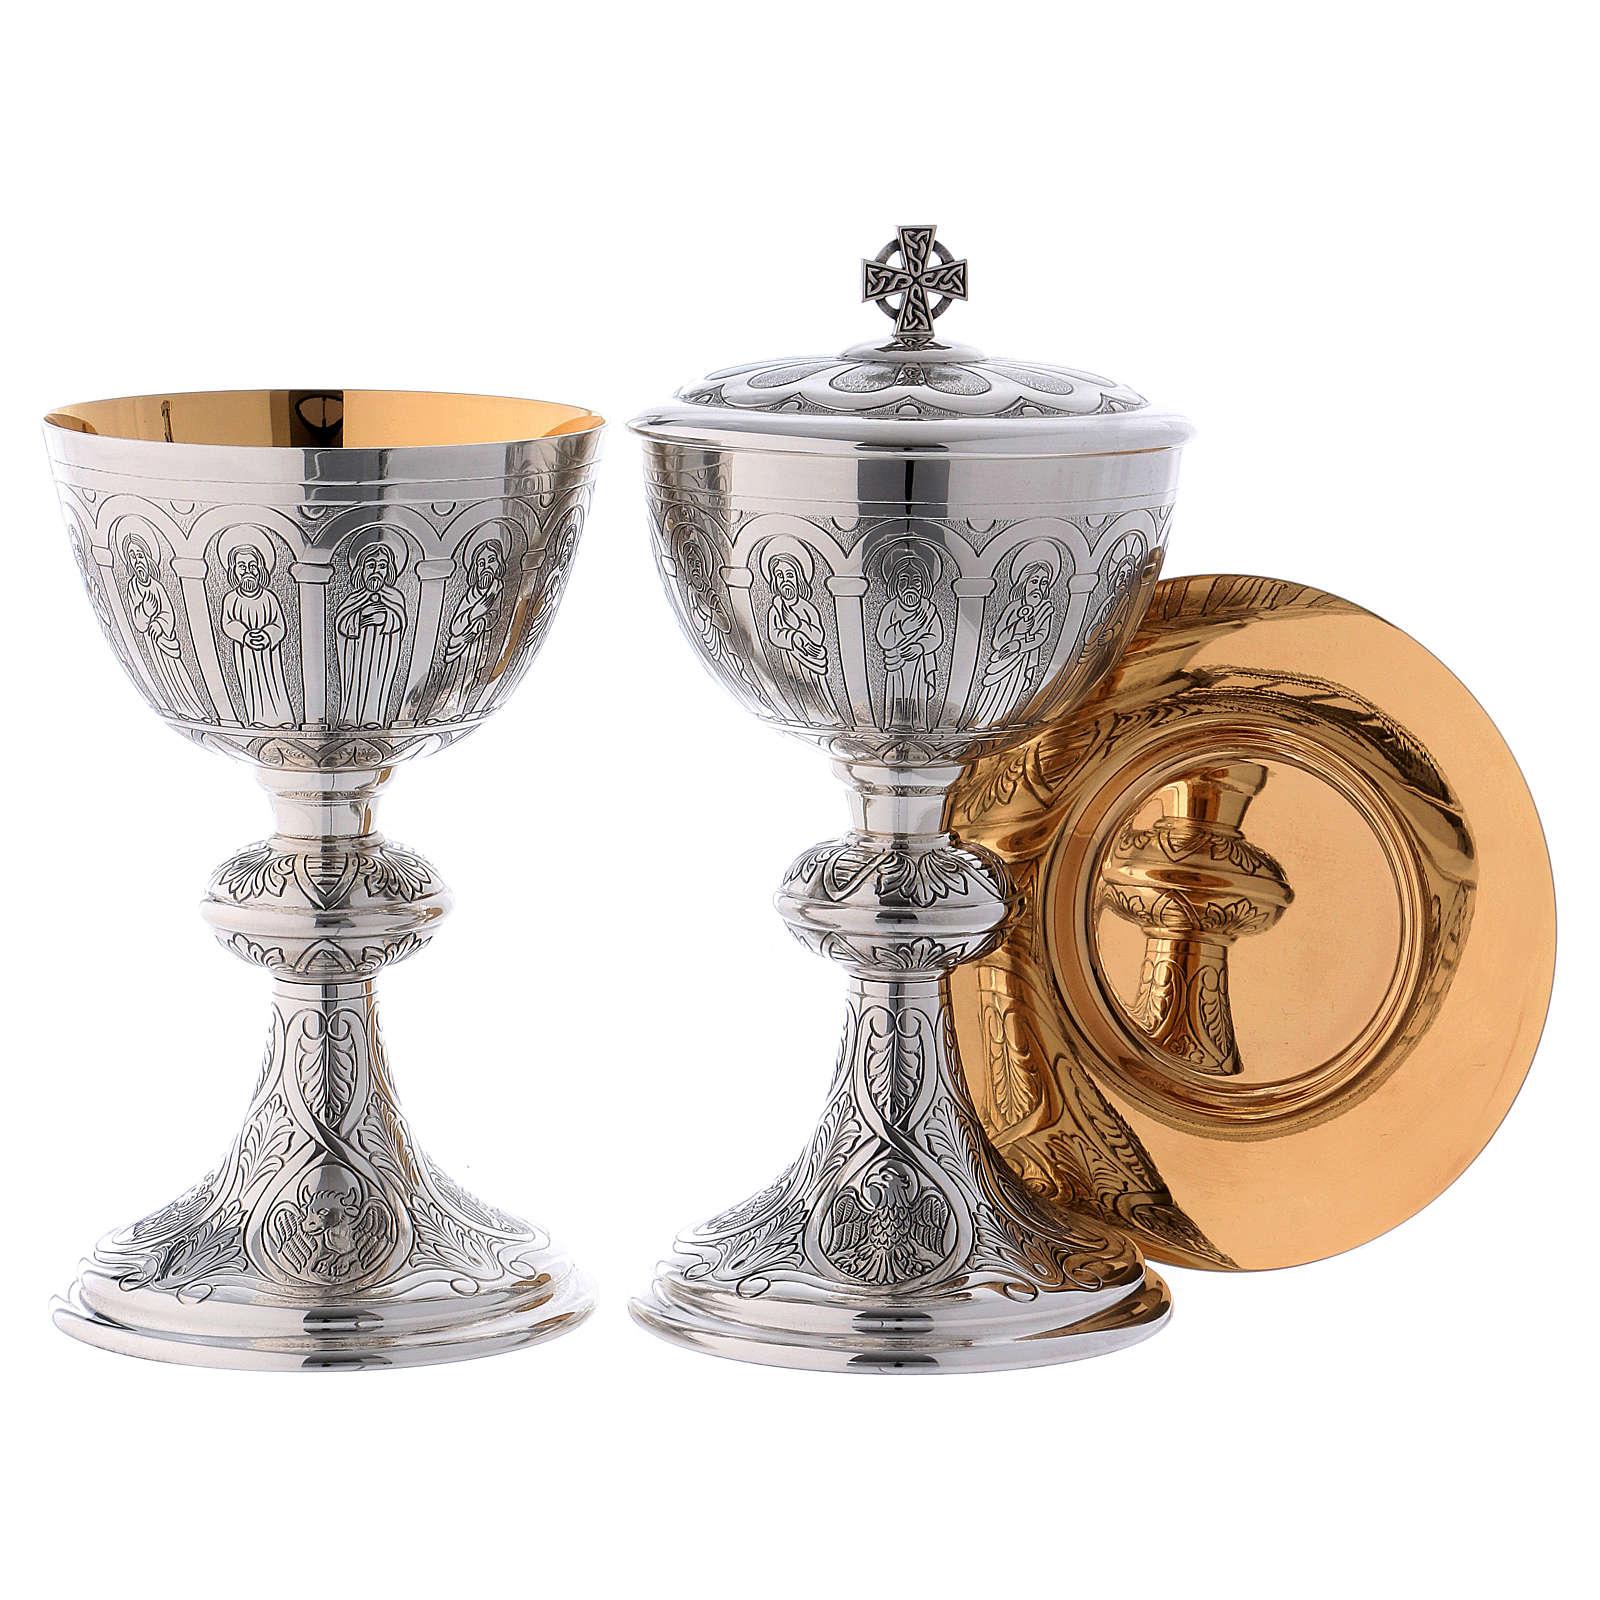 Calice Patena e Pisside Molina Apostoli Evangelisti argento massiccio 925 4